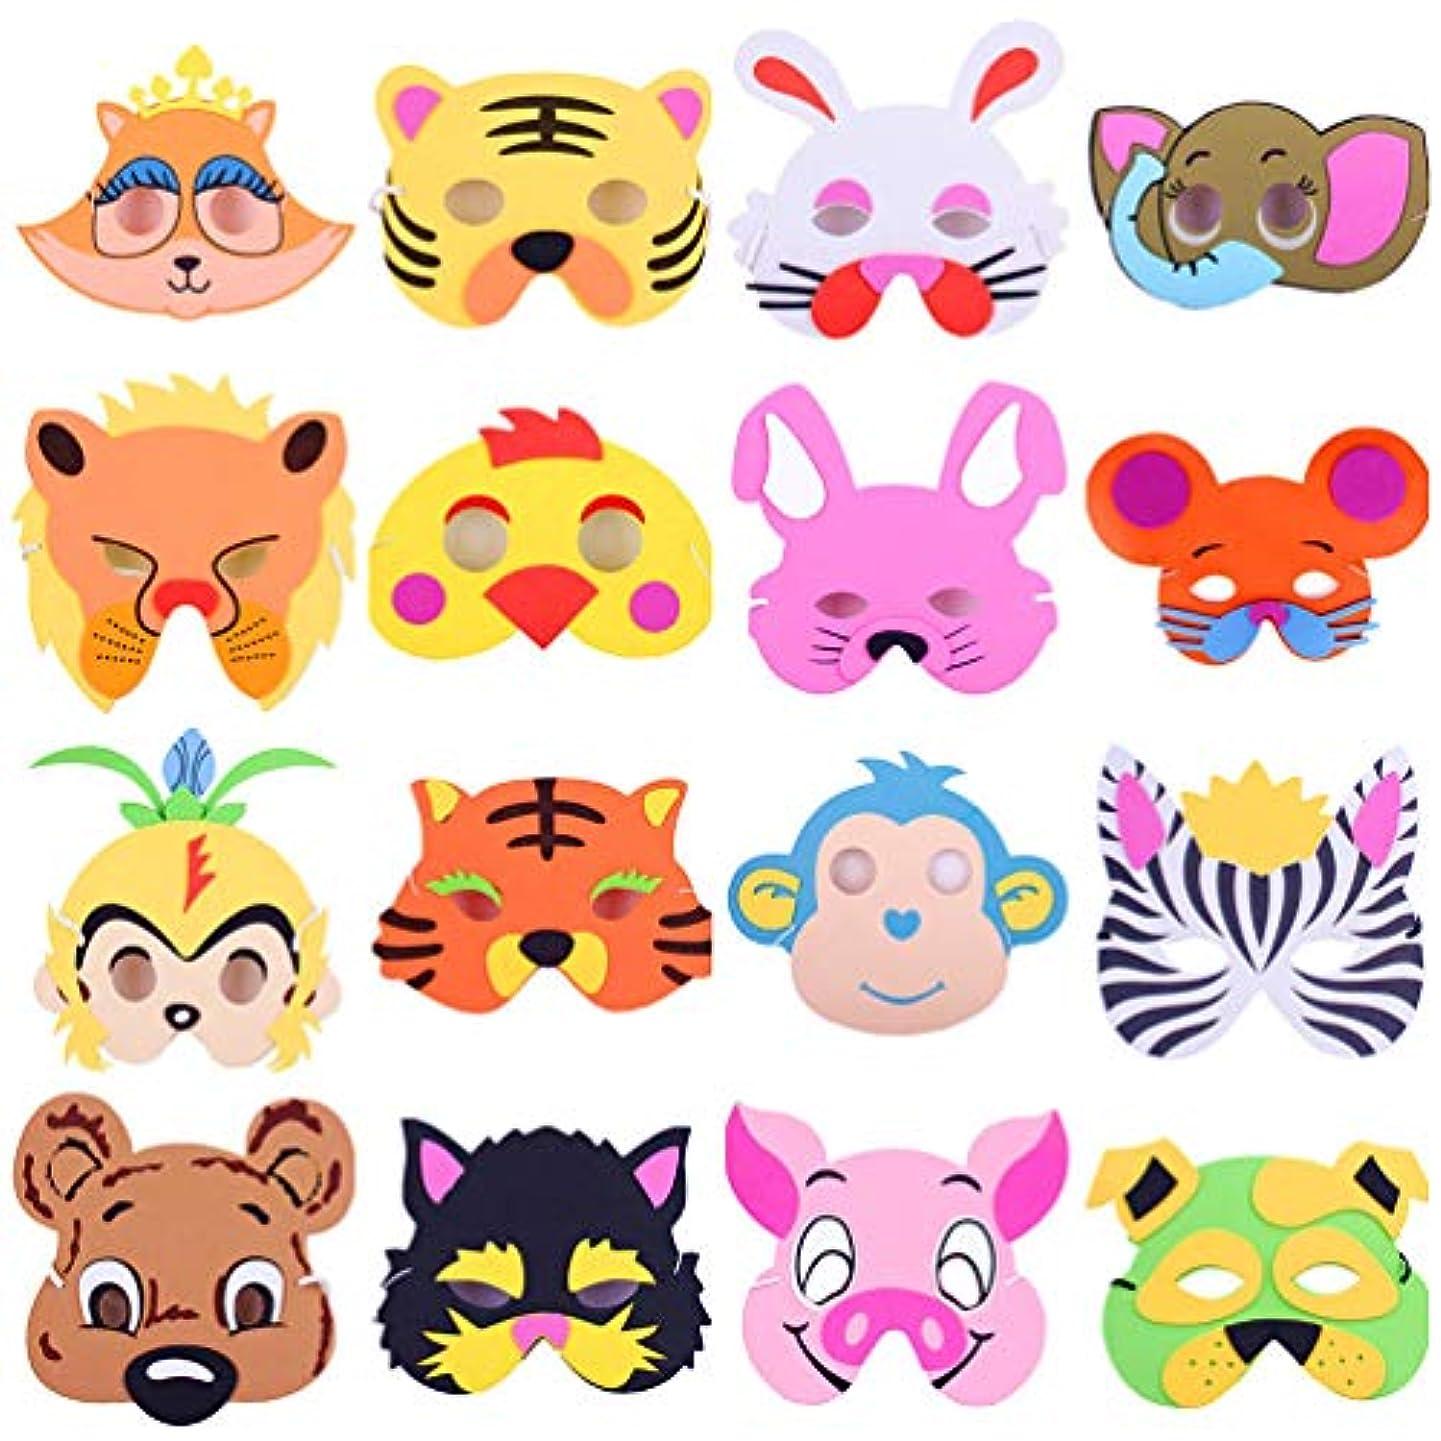 NUOBESTY フェイスマスクかわいい装飾evaクリエイティブ漫画面白いマスク動物マスクセットプロップマスク用キッズ大人16ピース